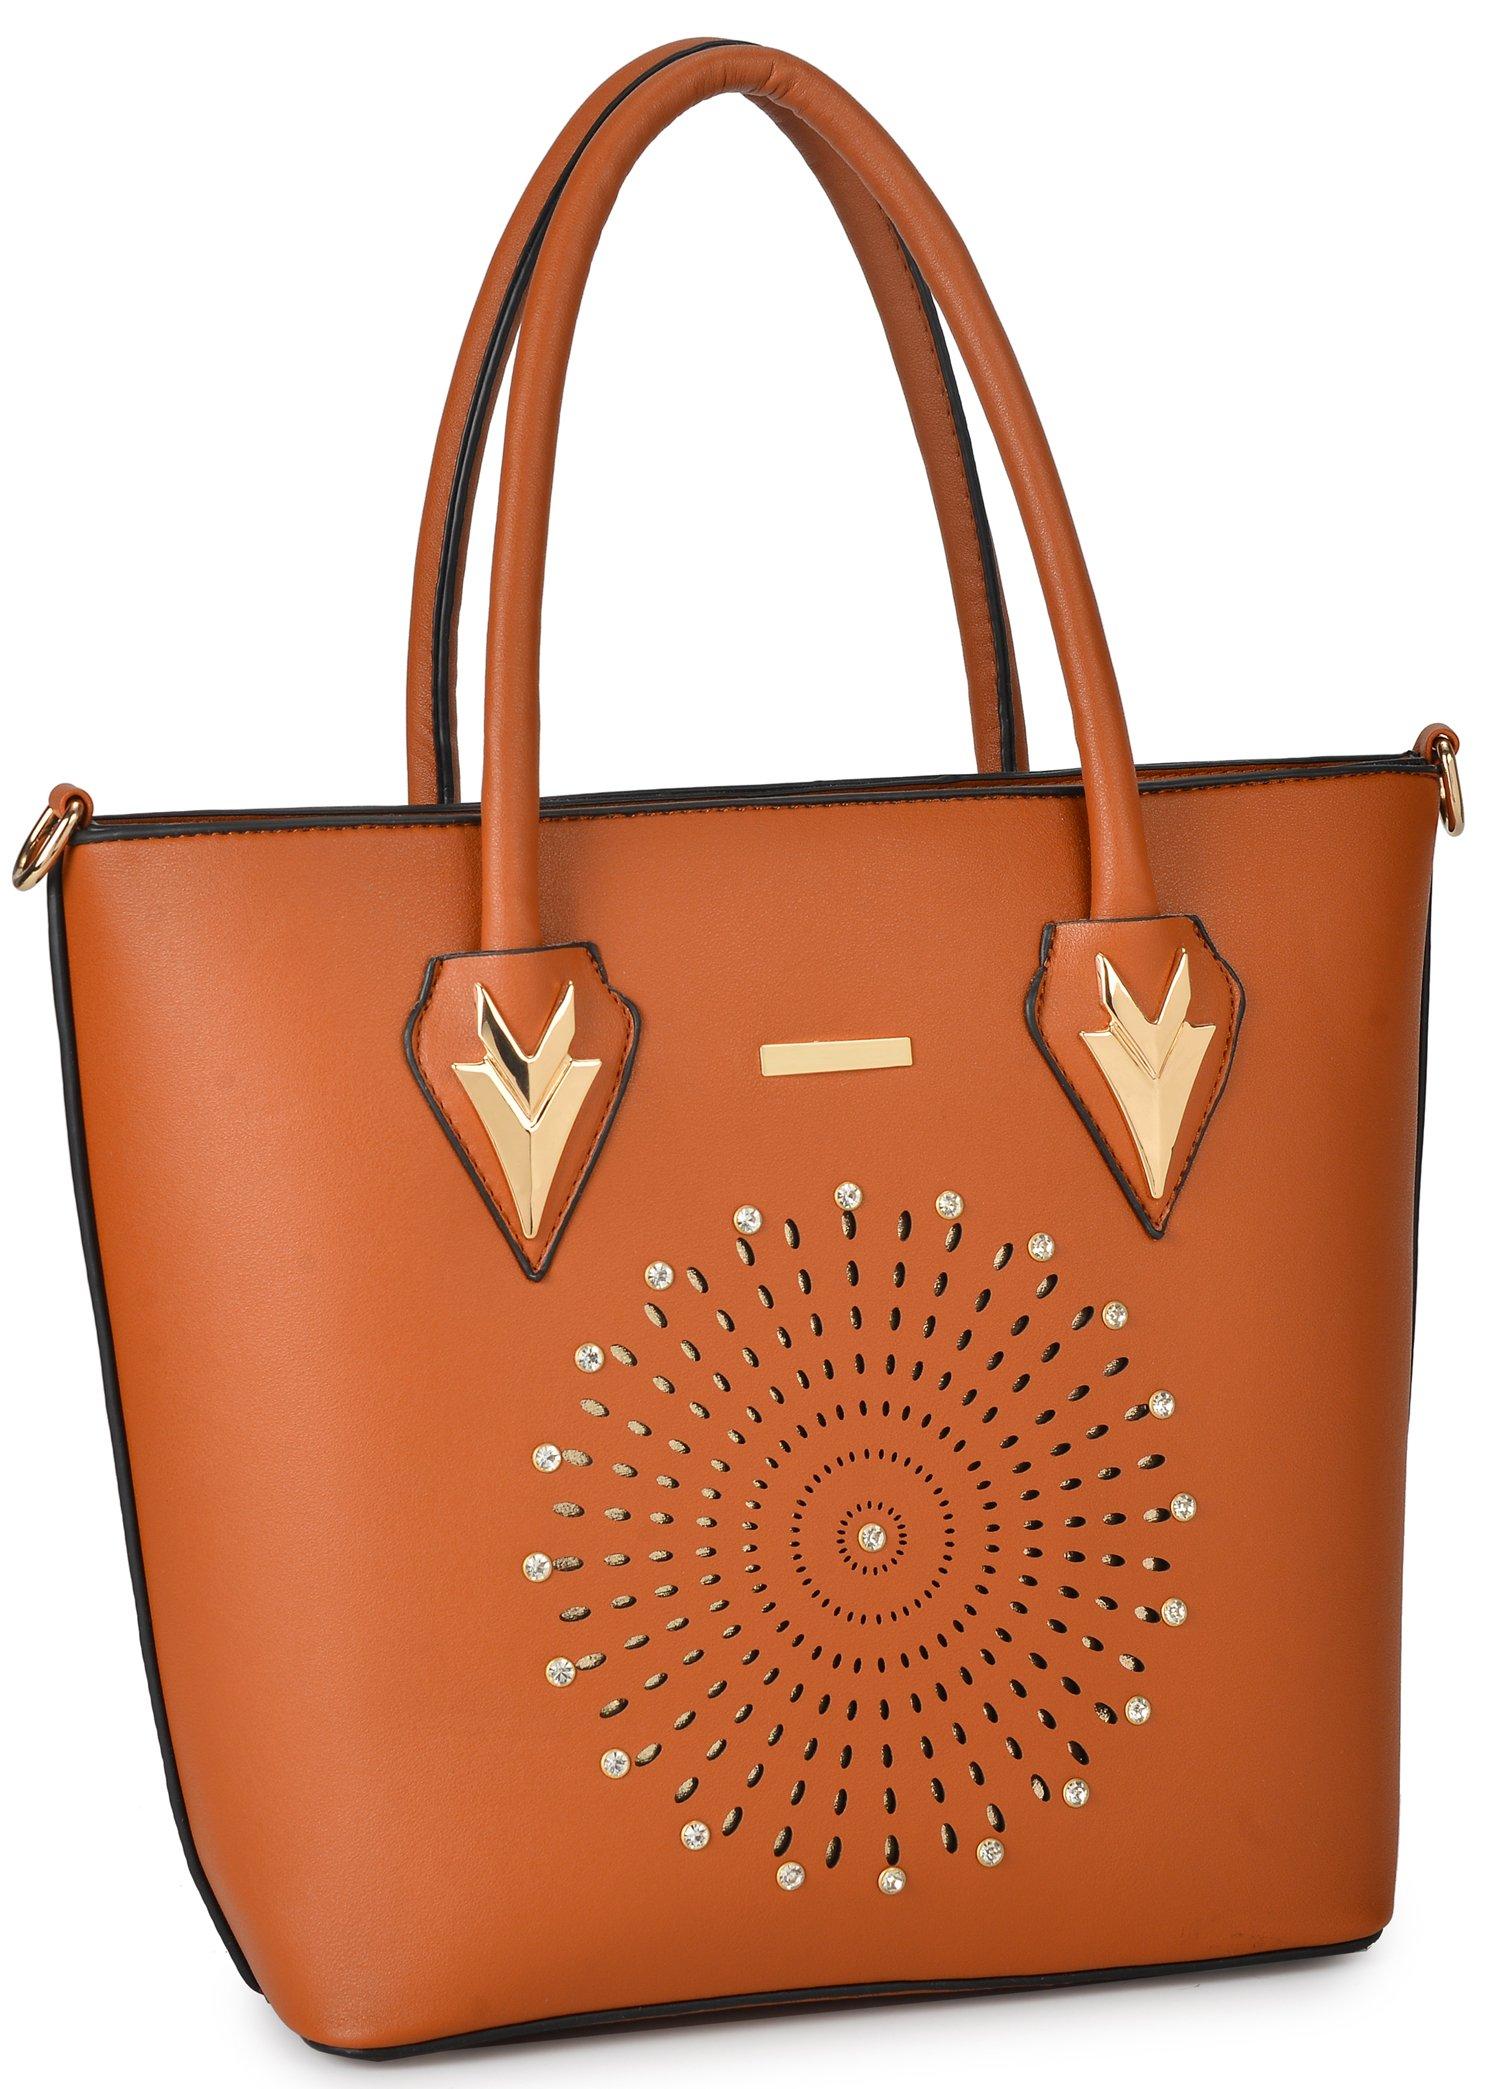 Women Handbag Purse Hobo Faux Leather Messenger Bag Clutch Satchel Bag 3 Piece Gift Set by KasPala (Image #3)